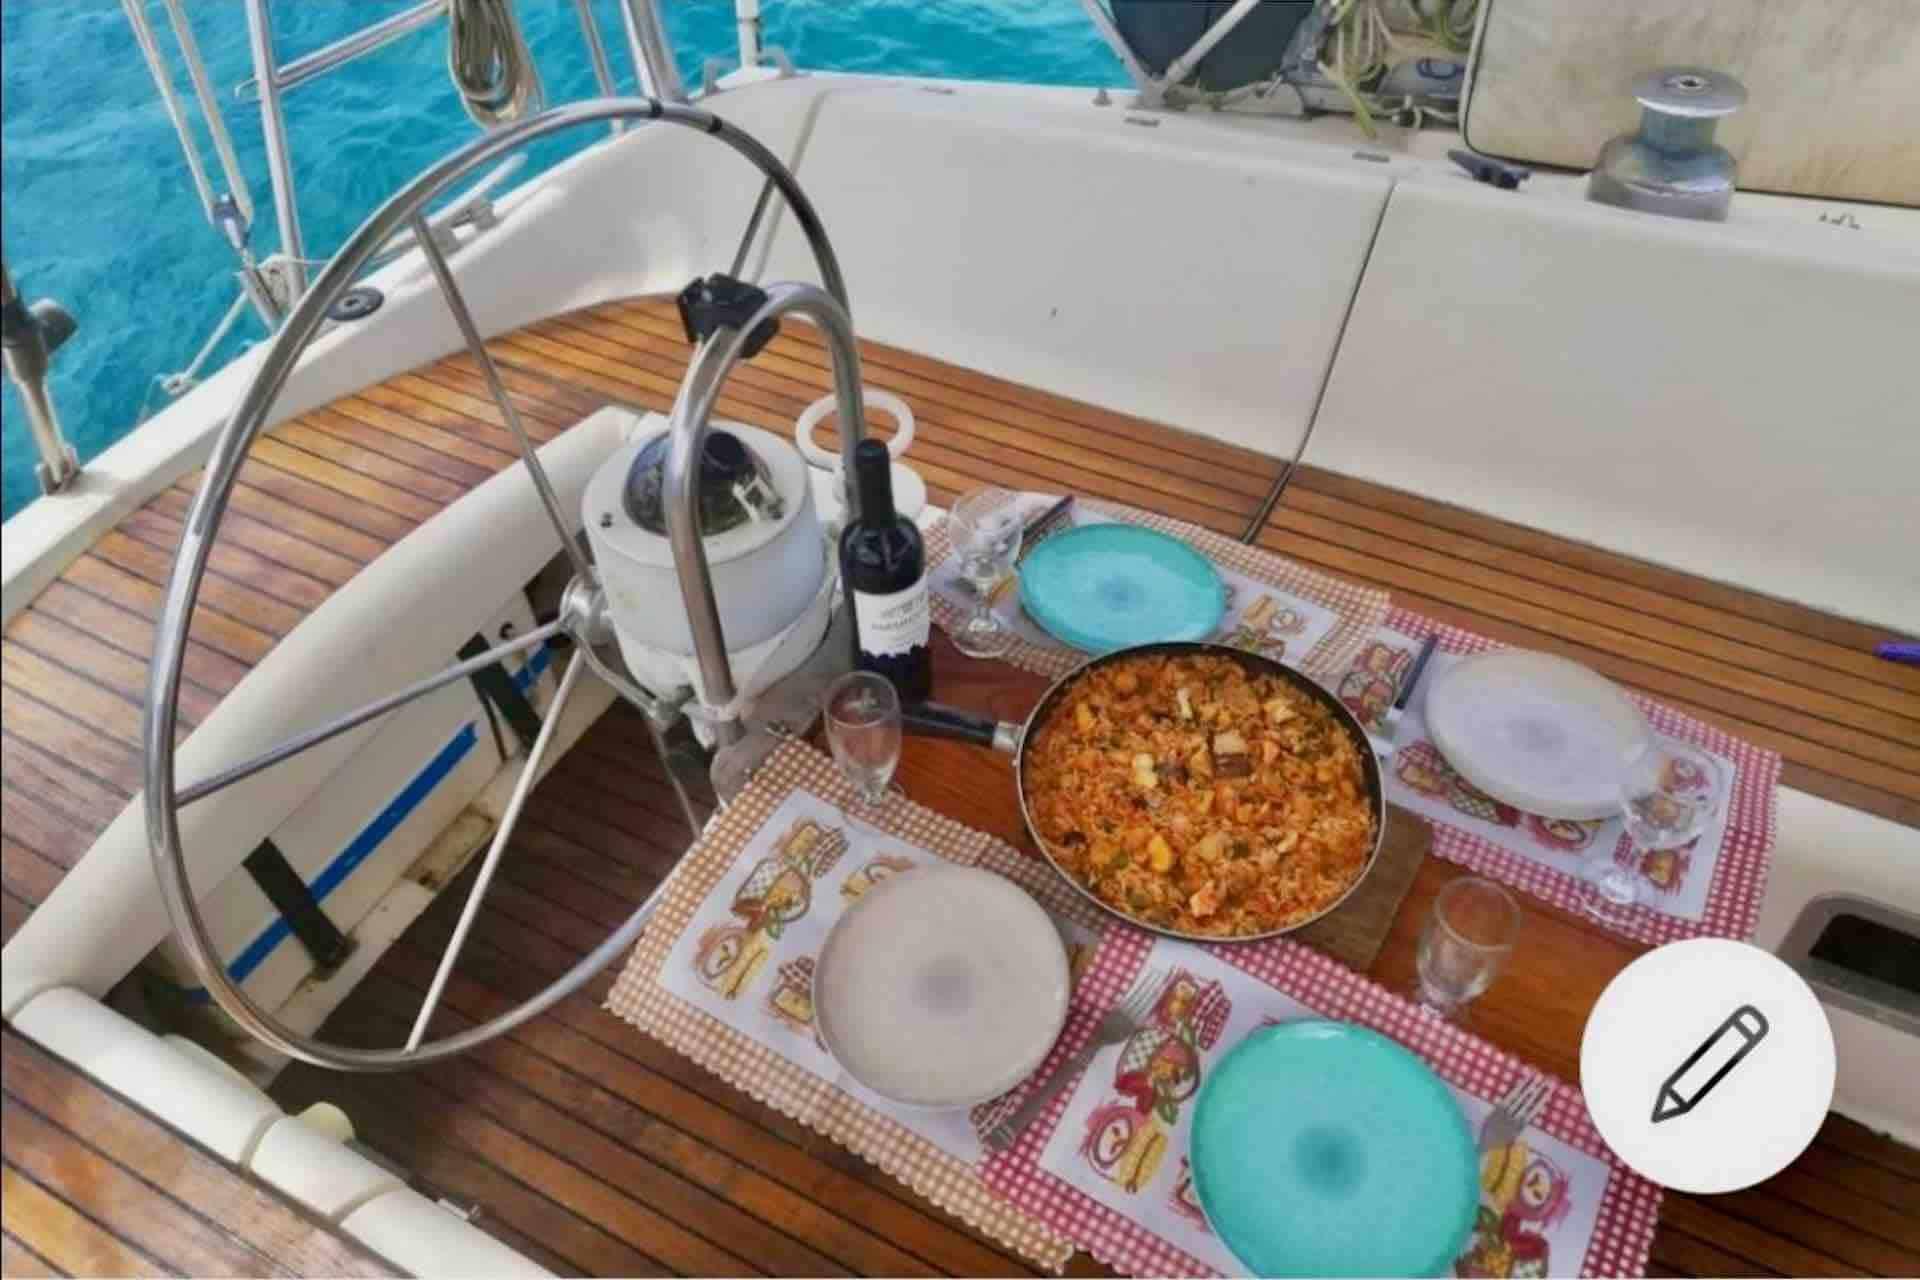 Dike San Blas sailboat cockpit with food